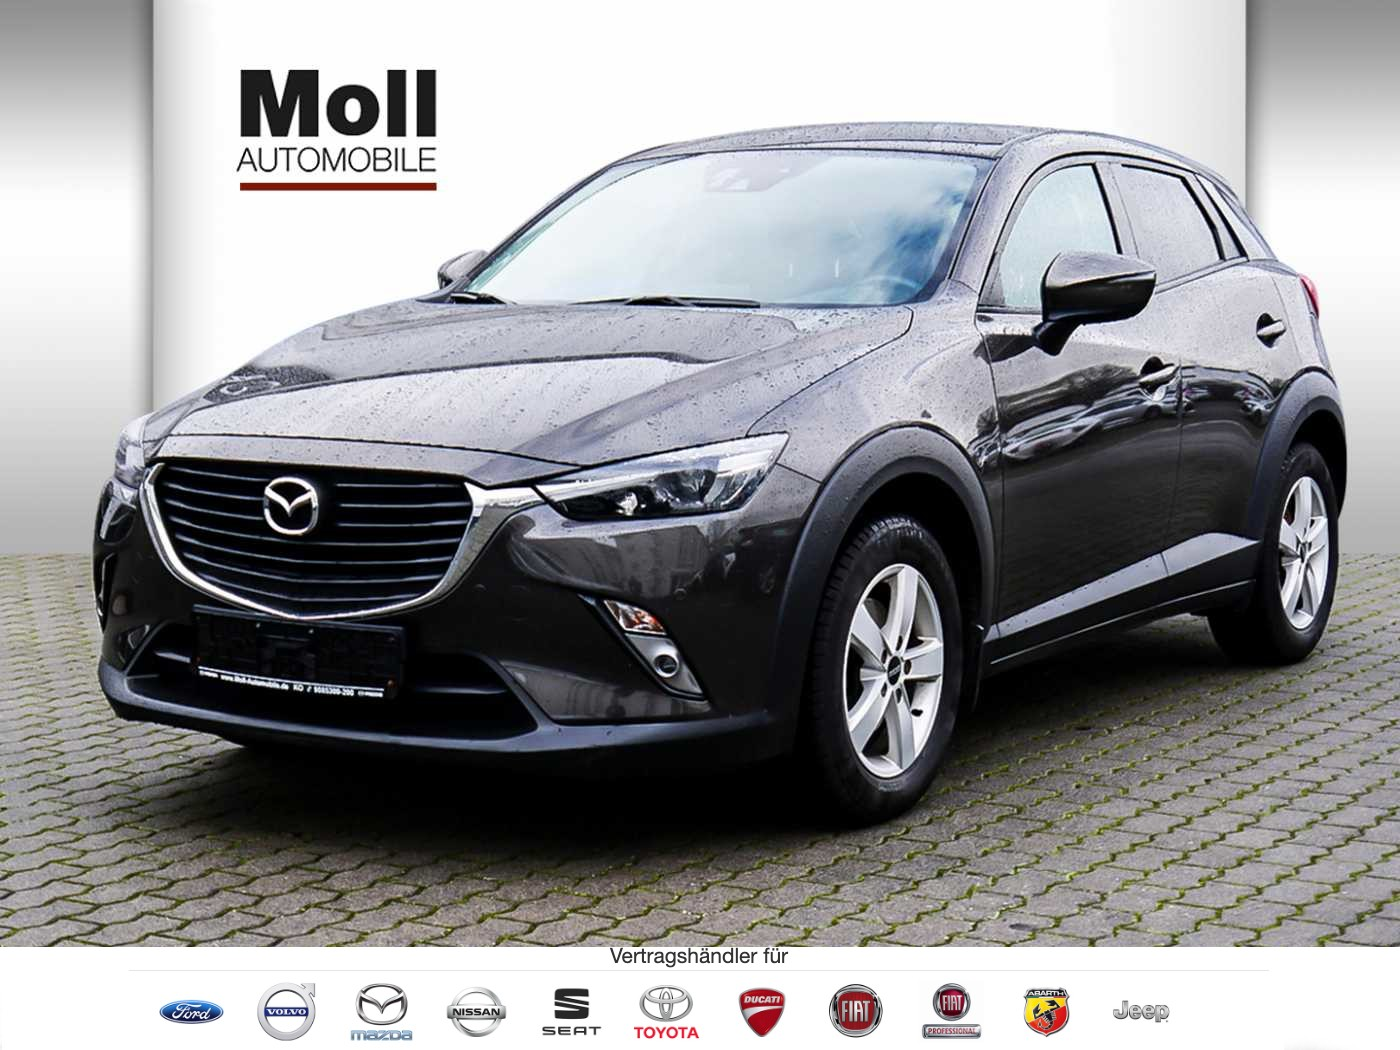 Mazda CX 3 Skyactive Exclusive Line Navi AHK CX-3 L SKYACTIV-G 120 FWD 5T 6GS AL-EXCLUSIVE, Jahr 2016, Benzin